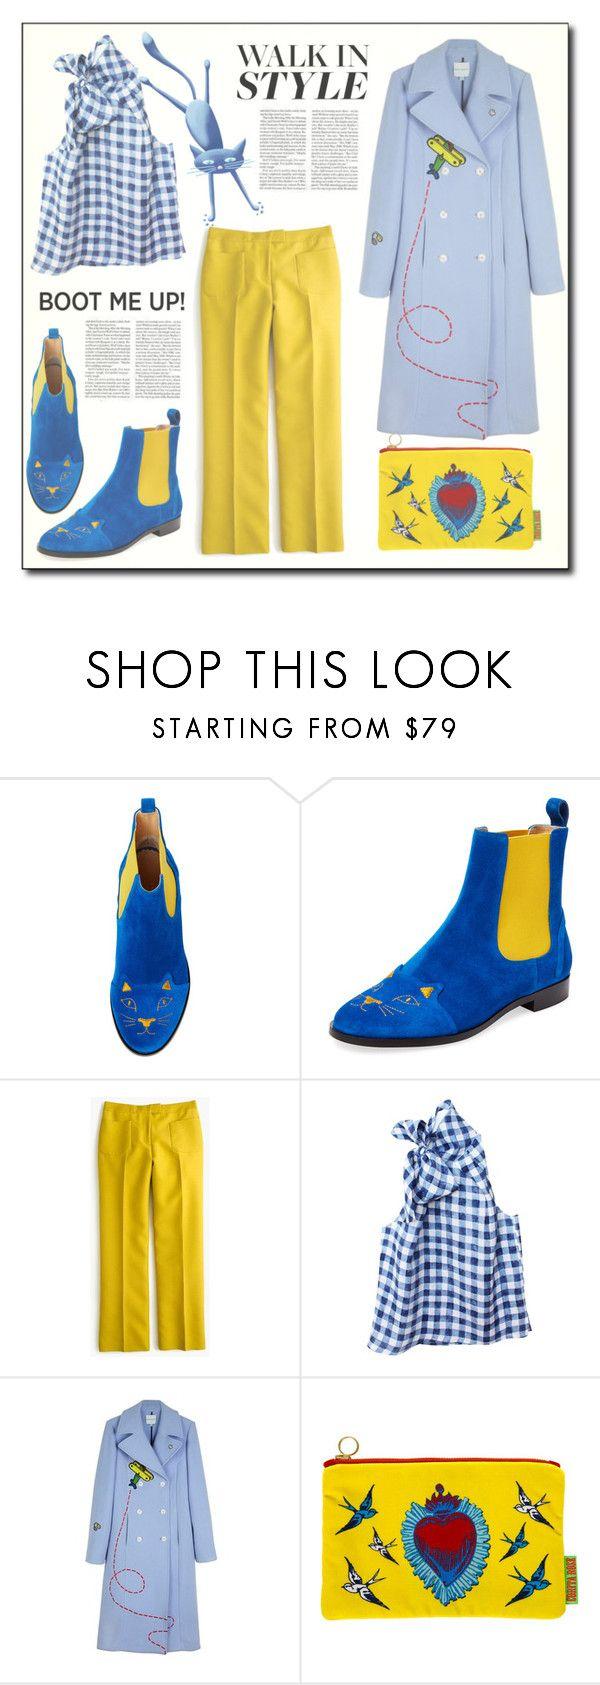 """Kick It: Chelsea Boots"" by dorinela-hamamci ❤ liked on Polyvore featuring Charlotte Olympia, J.Crew, Etrala London, Mira Mikati, Corita Rose, polyvoreeditorial, chelseaboots, polyvorecontest and polyvoreditorial"